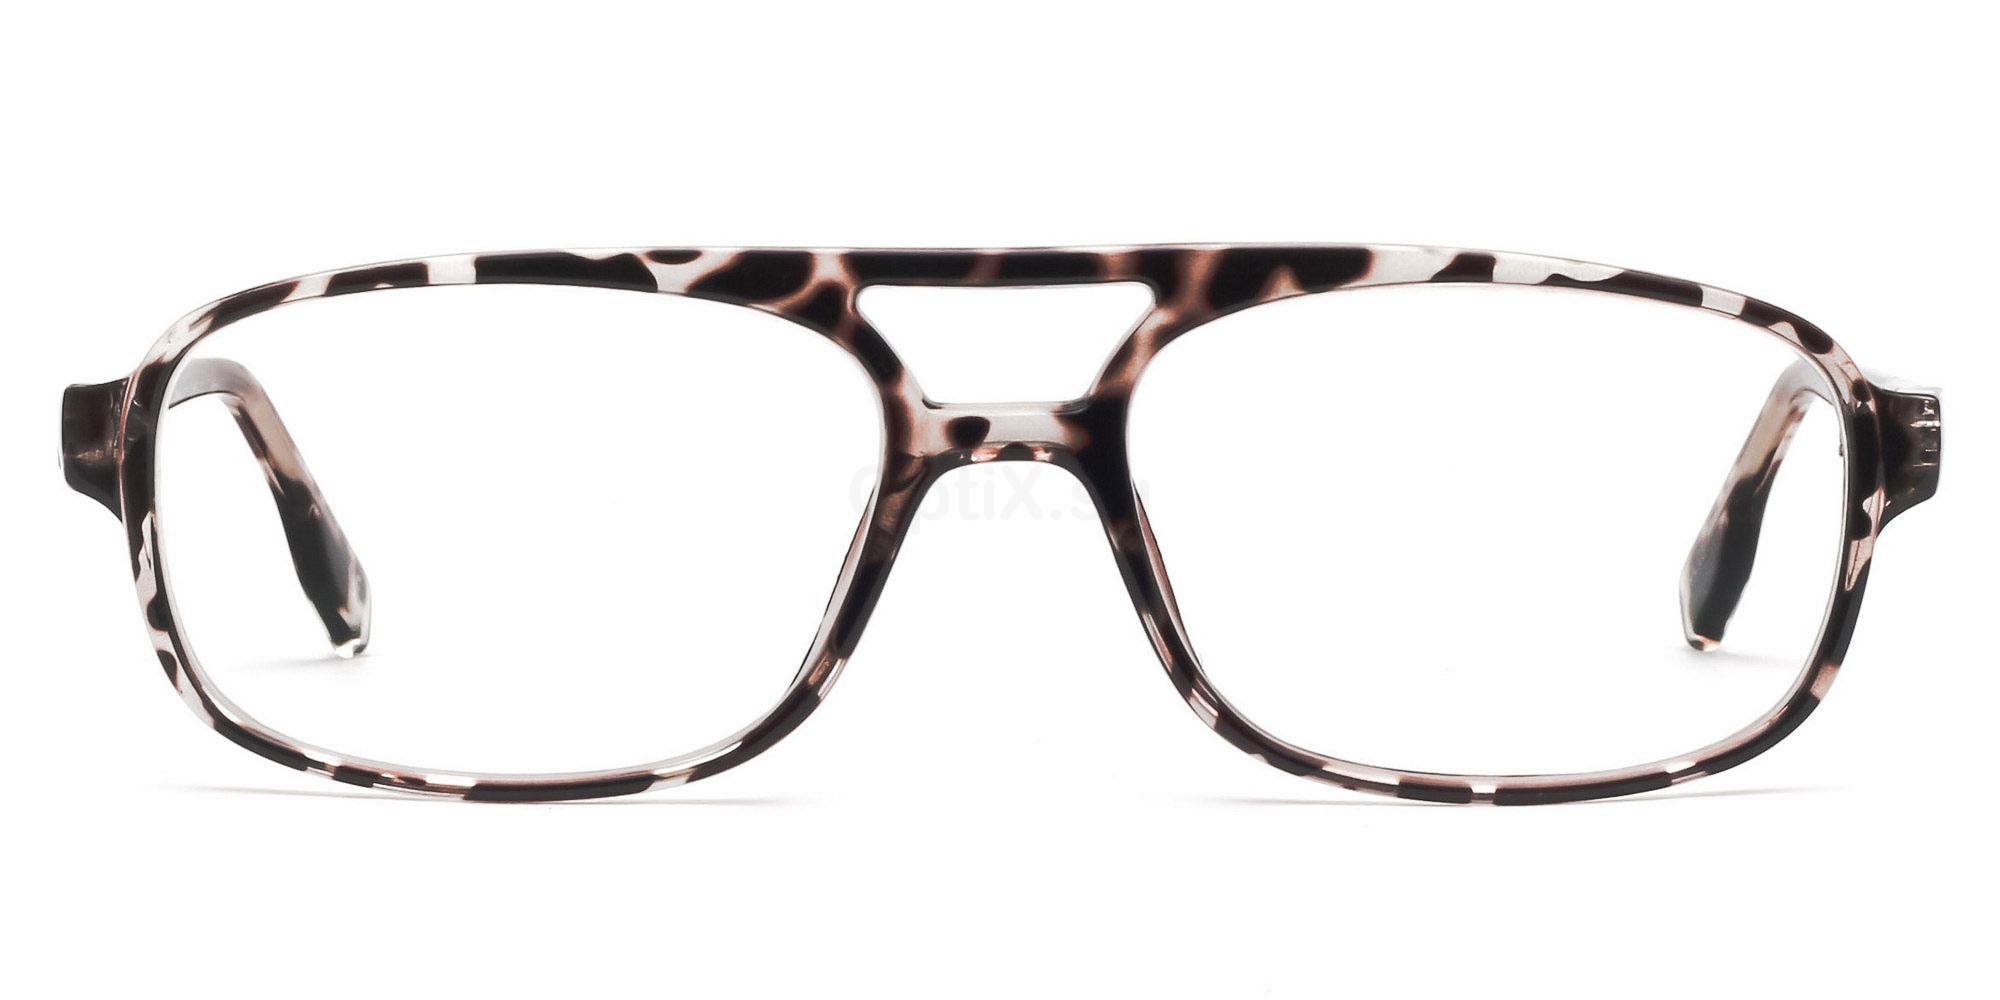 C3 P2395 - Animal Print Glasses, SelectSpecs